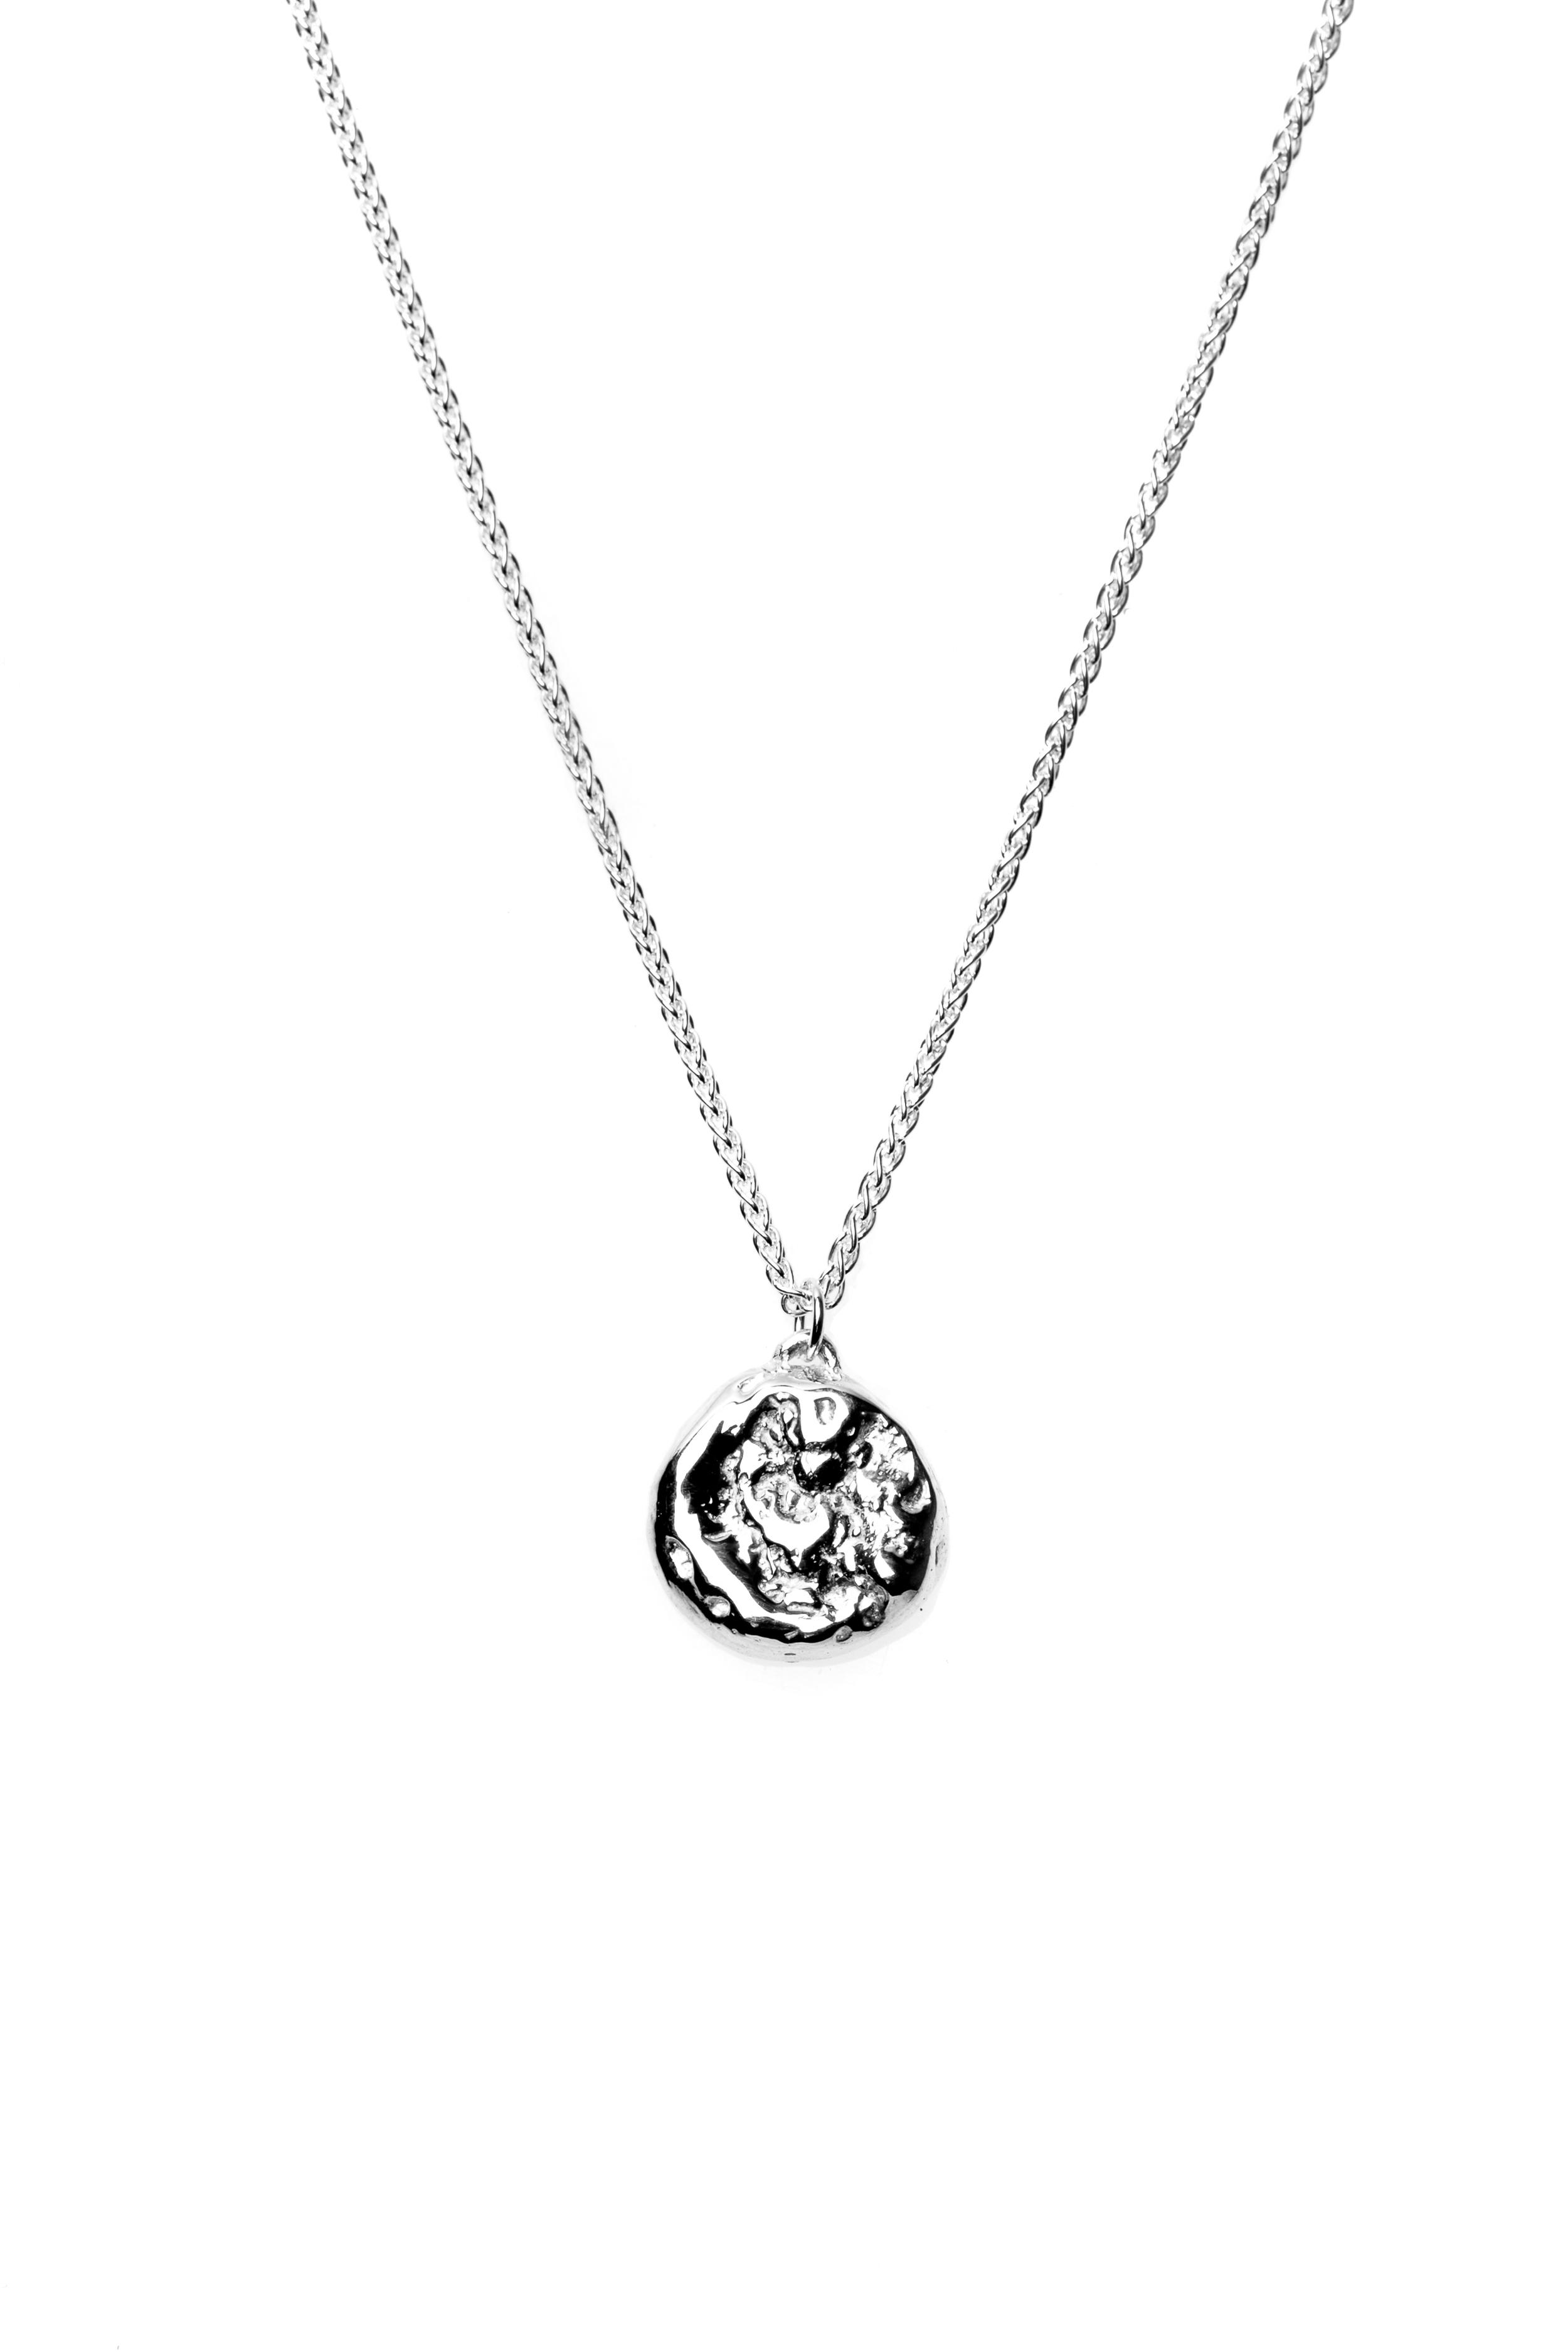 Detail Preserve Glacier Necklace